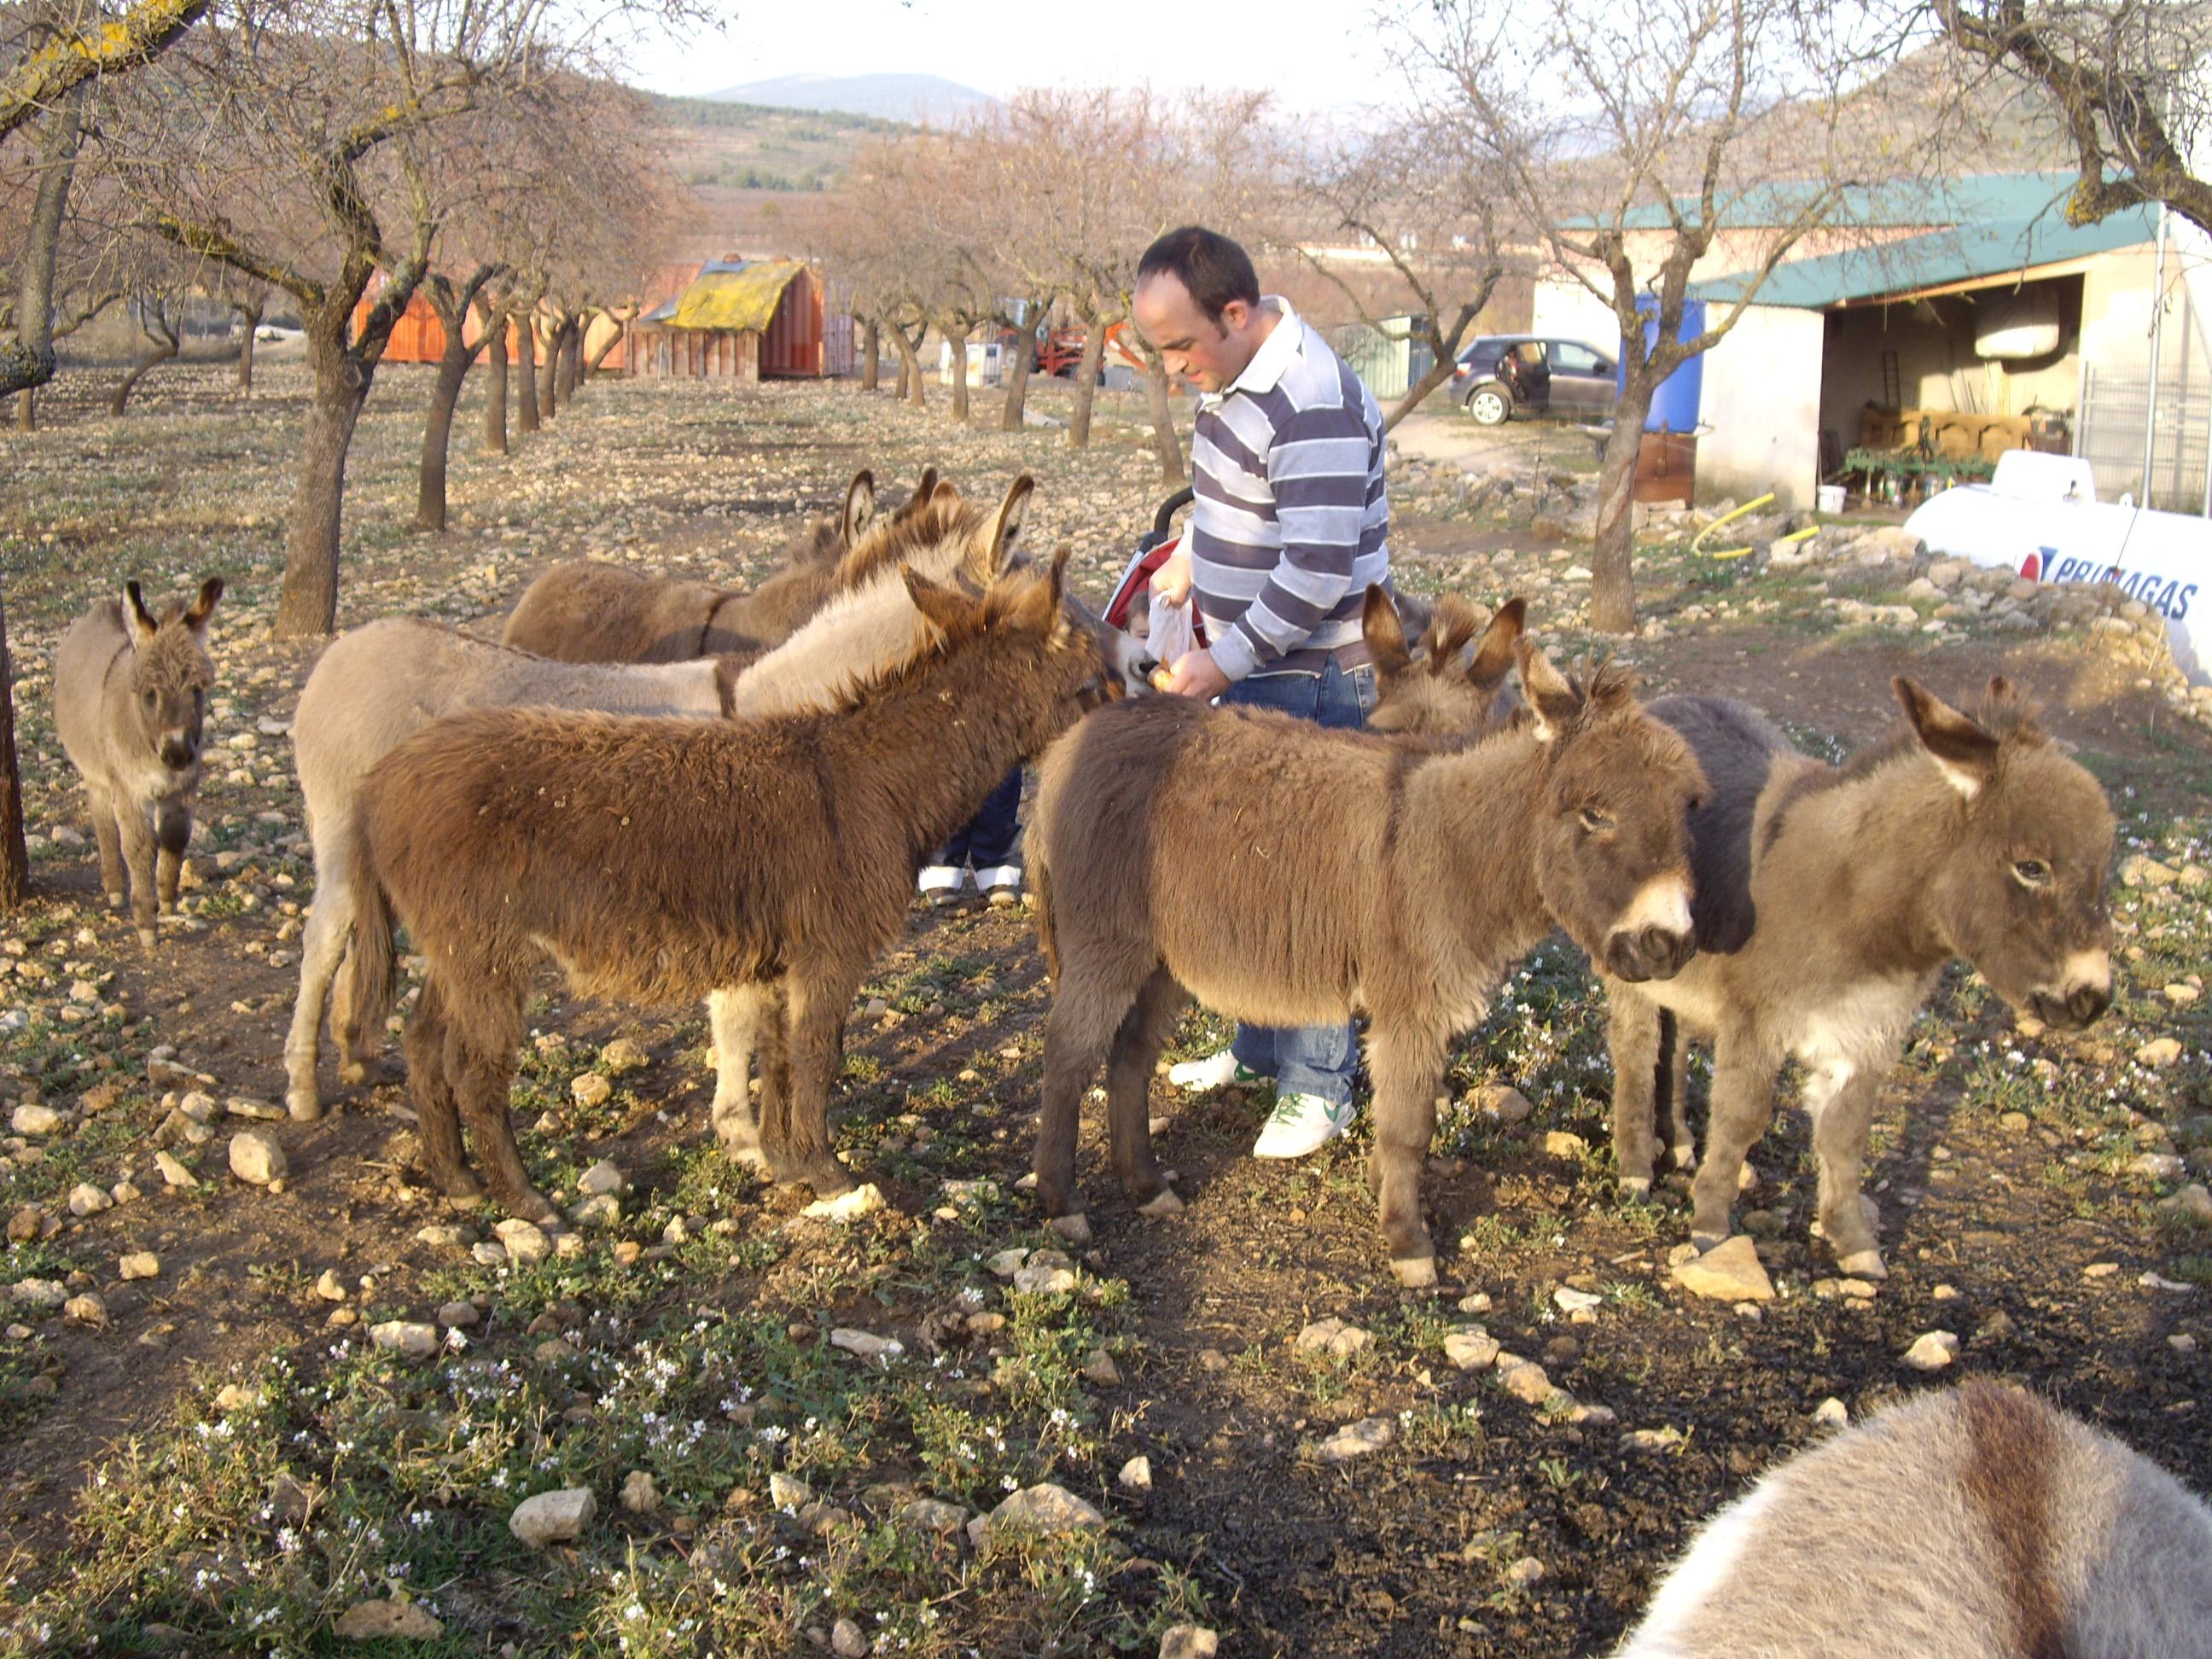 varios burros